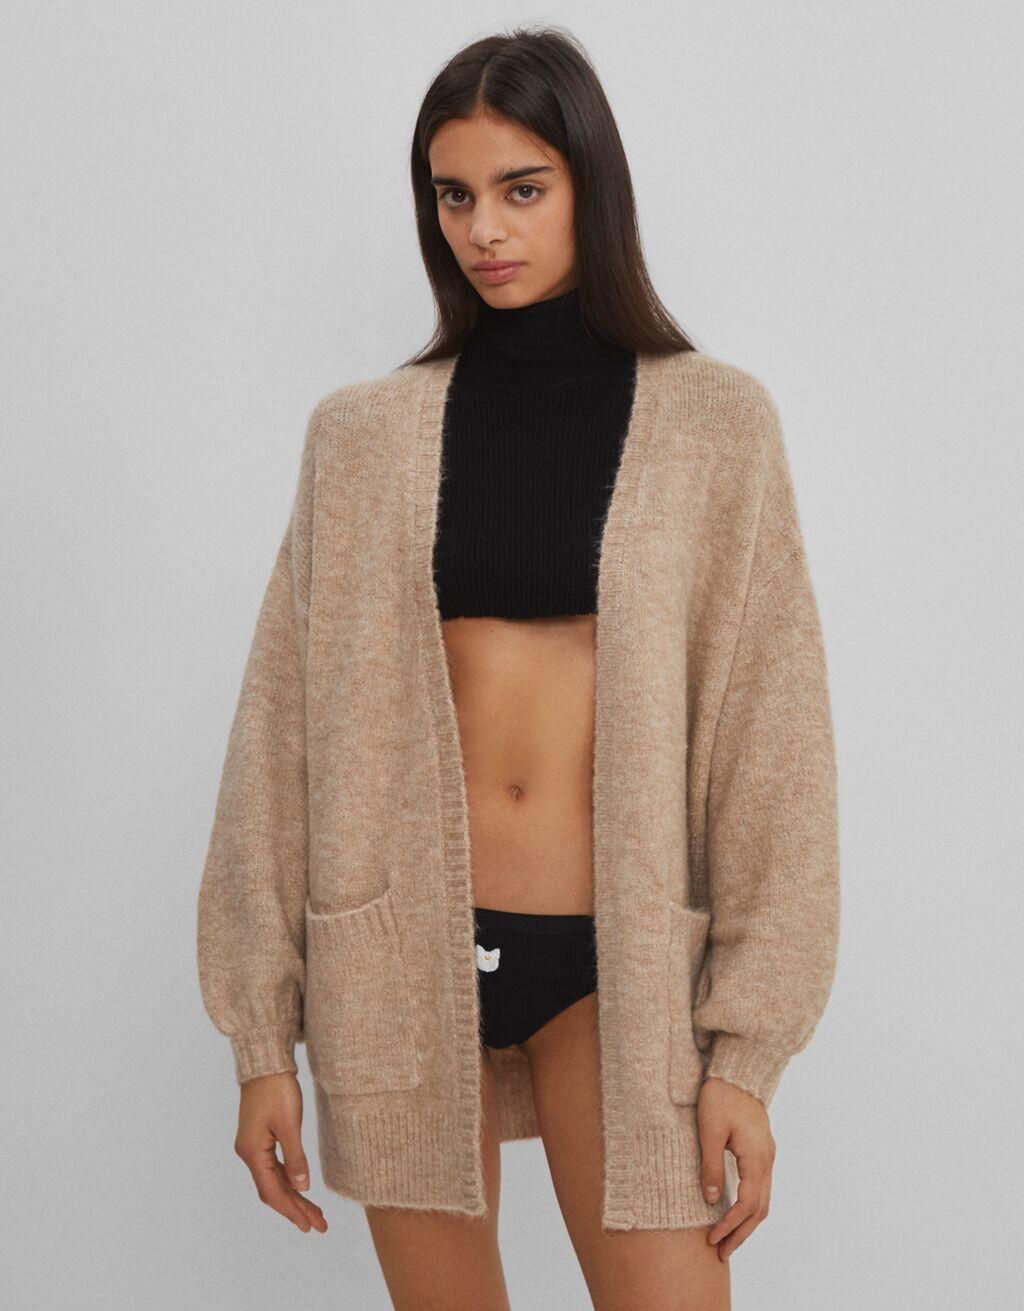 Full sleeve knit cardigan